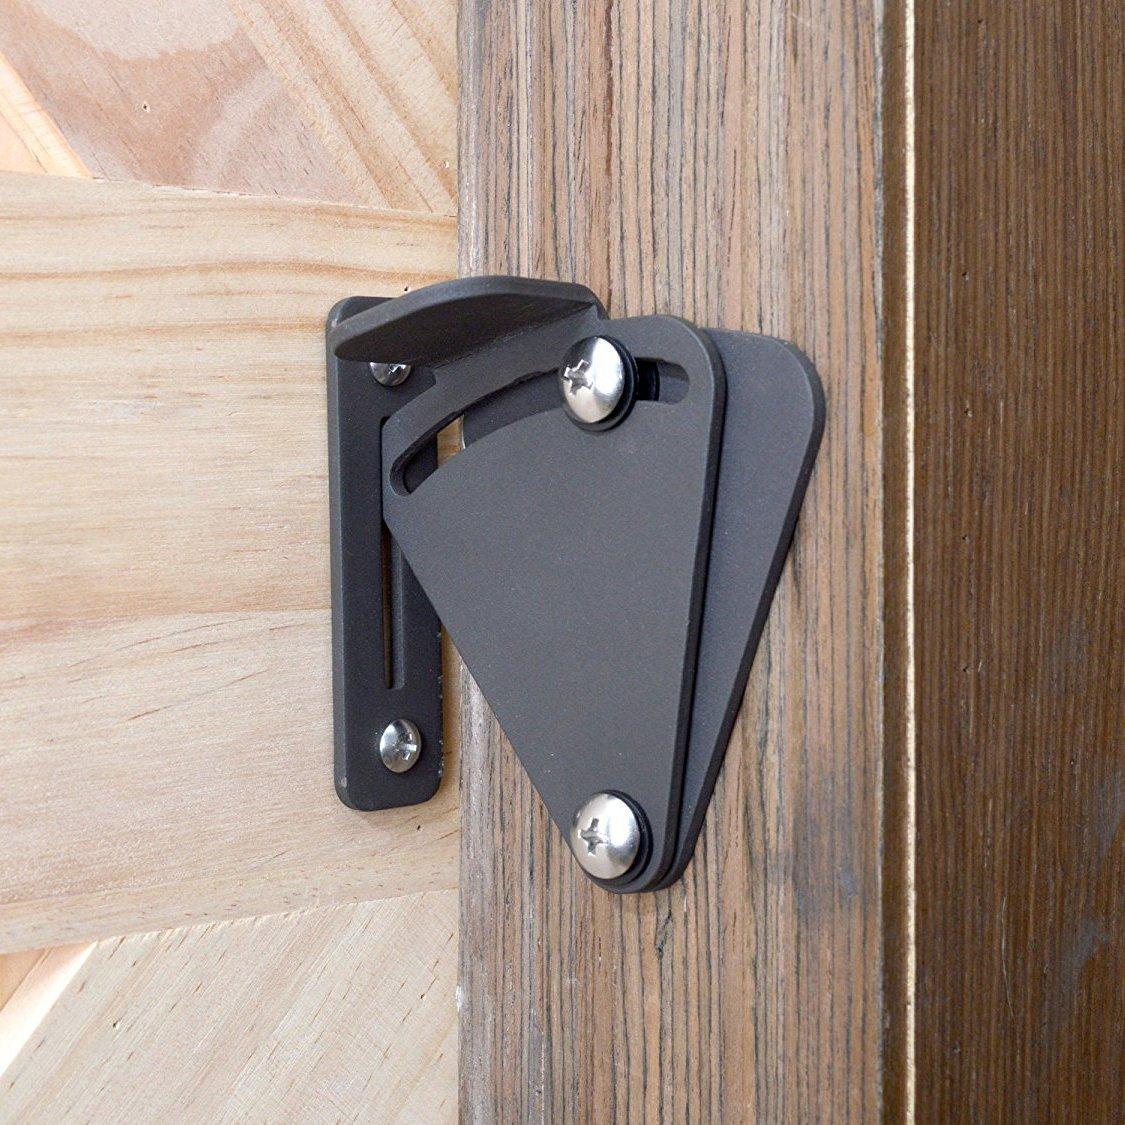 Rustic Style Wood Door Latch Privacy Lock - Black Powder Coated